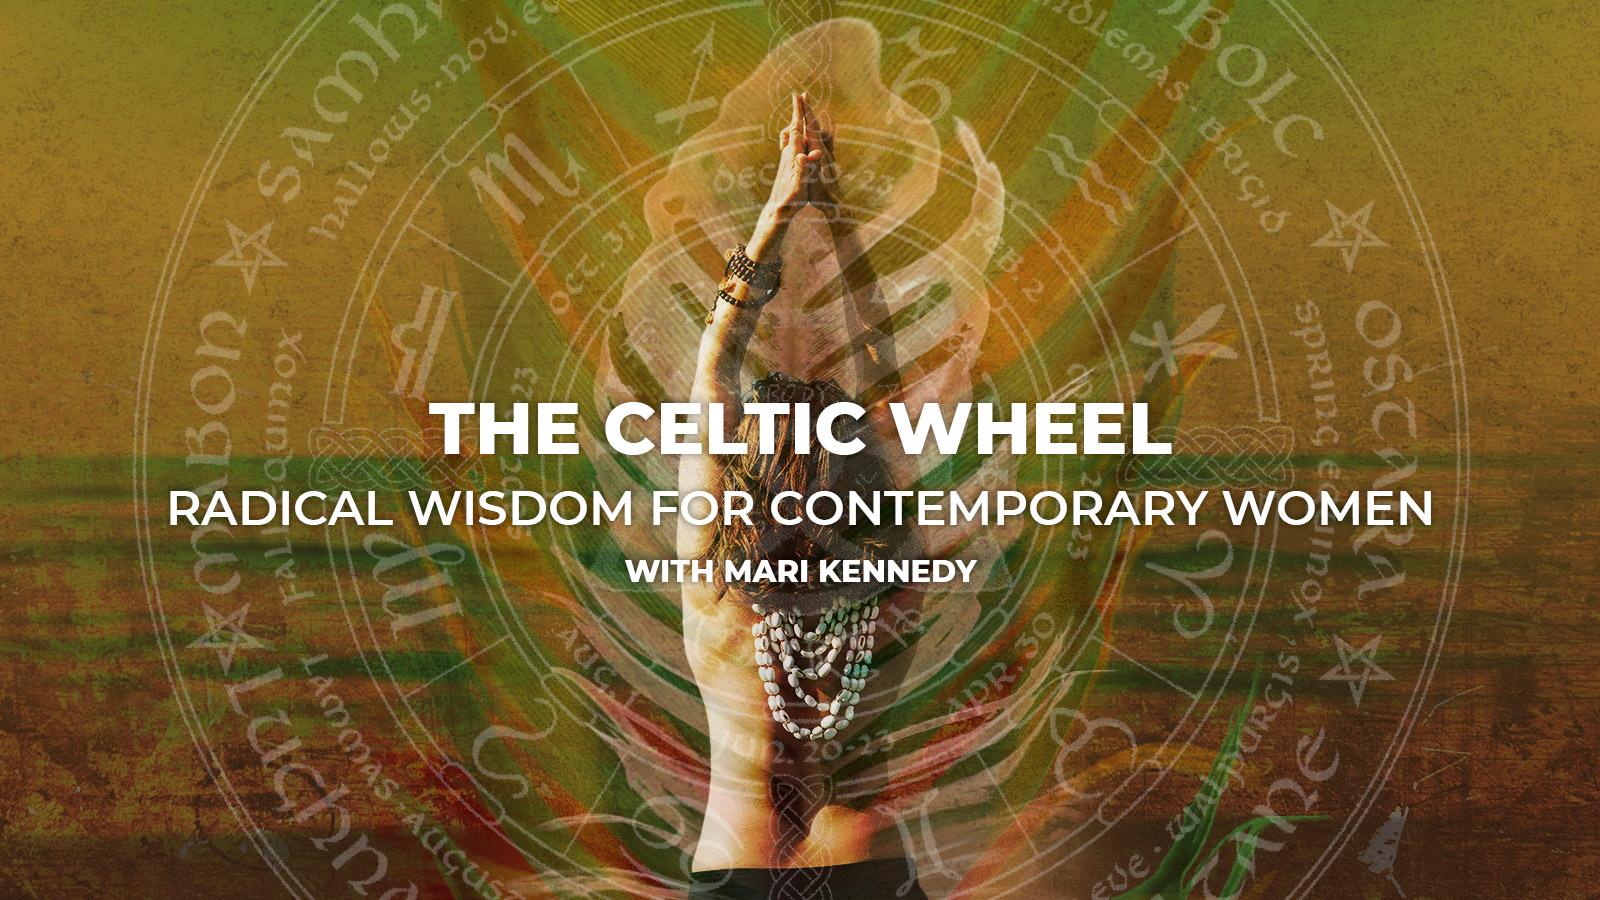 celtic-wheel-lead-image-FB-FINAL.jpg